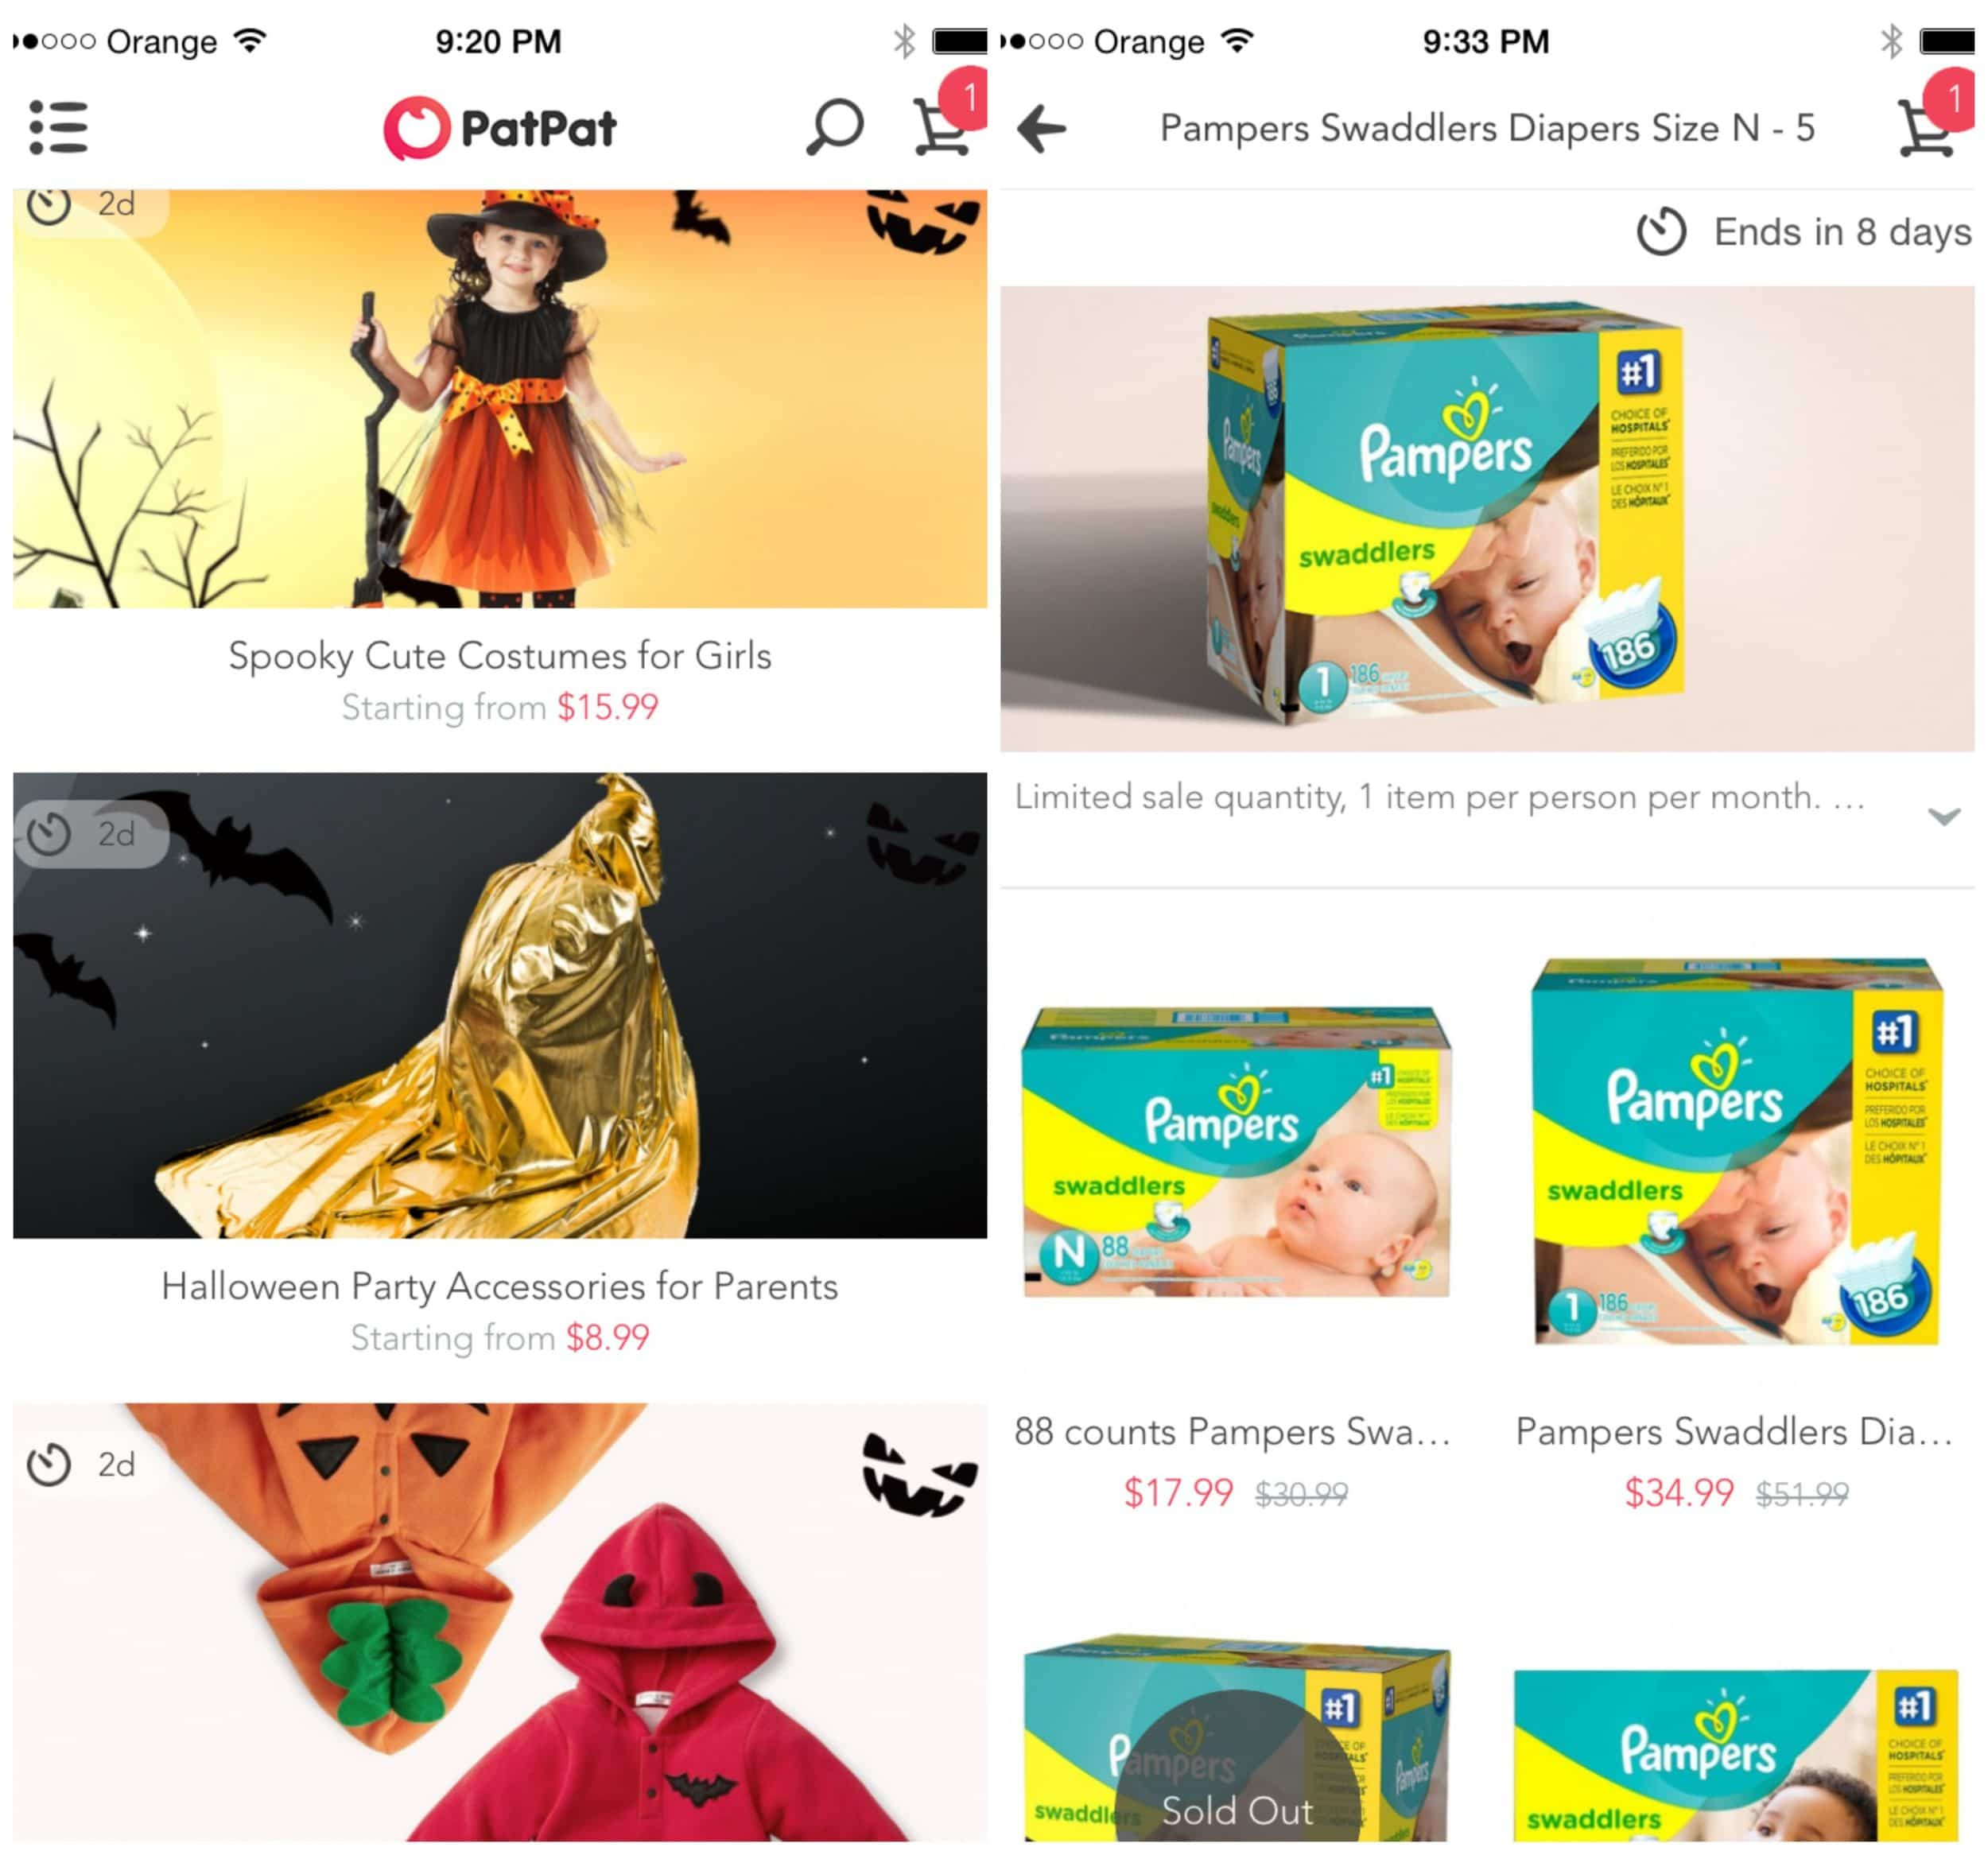 patpat app for moms deals